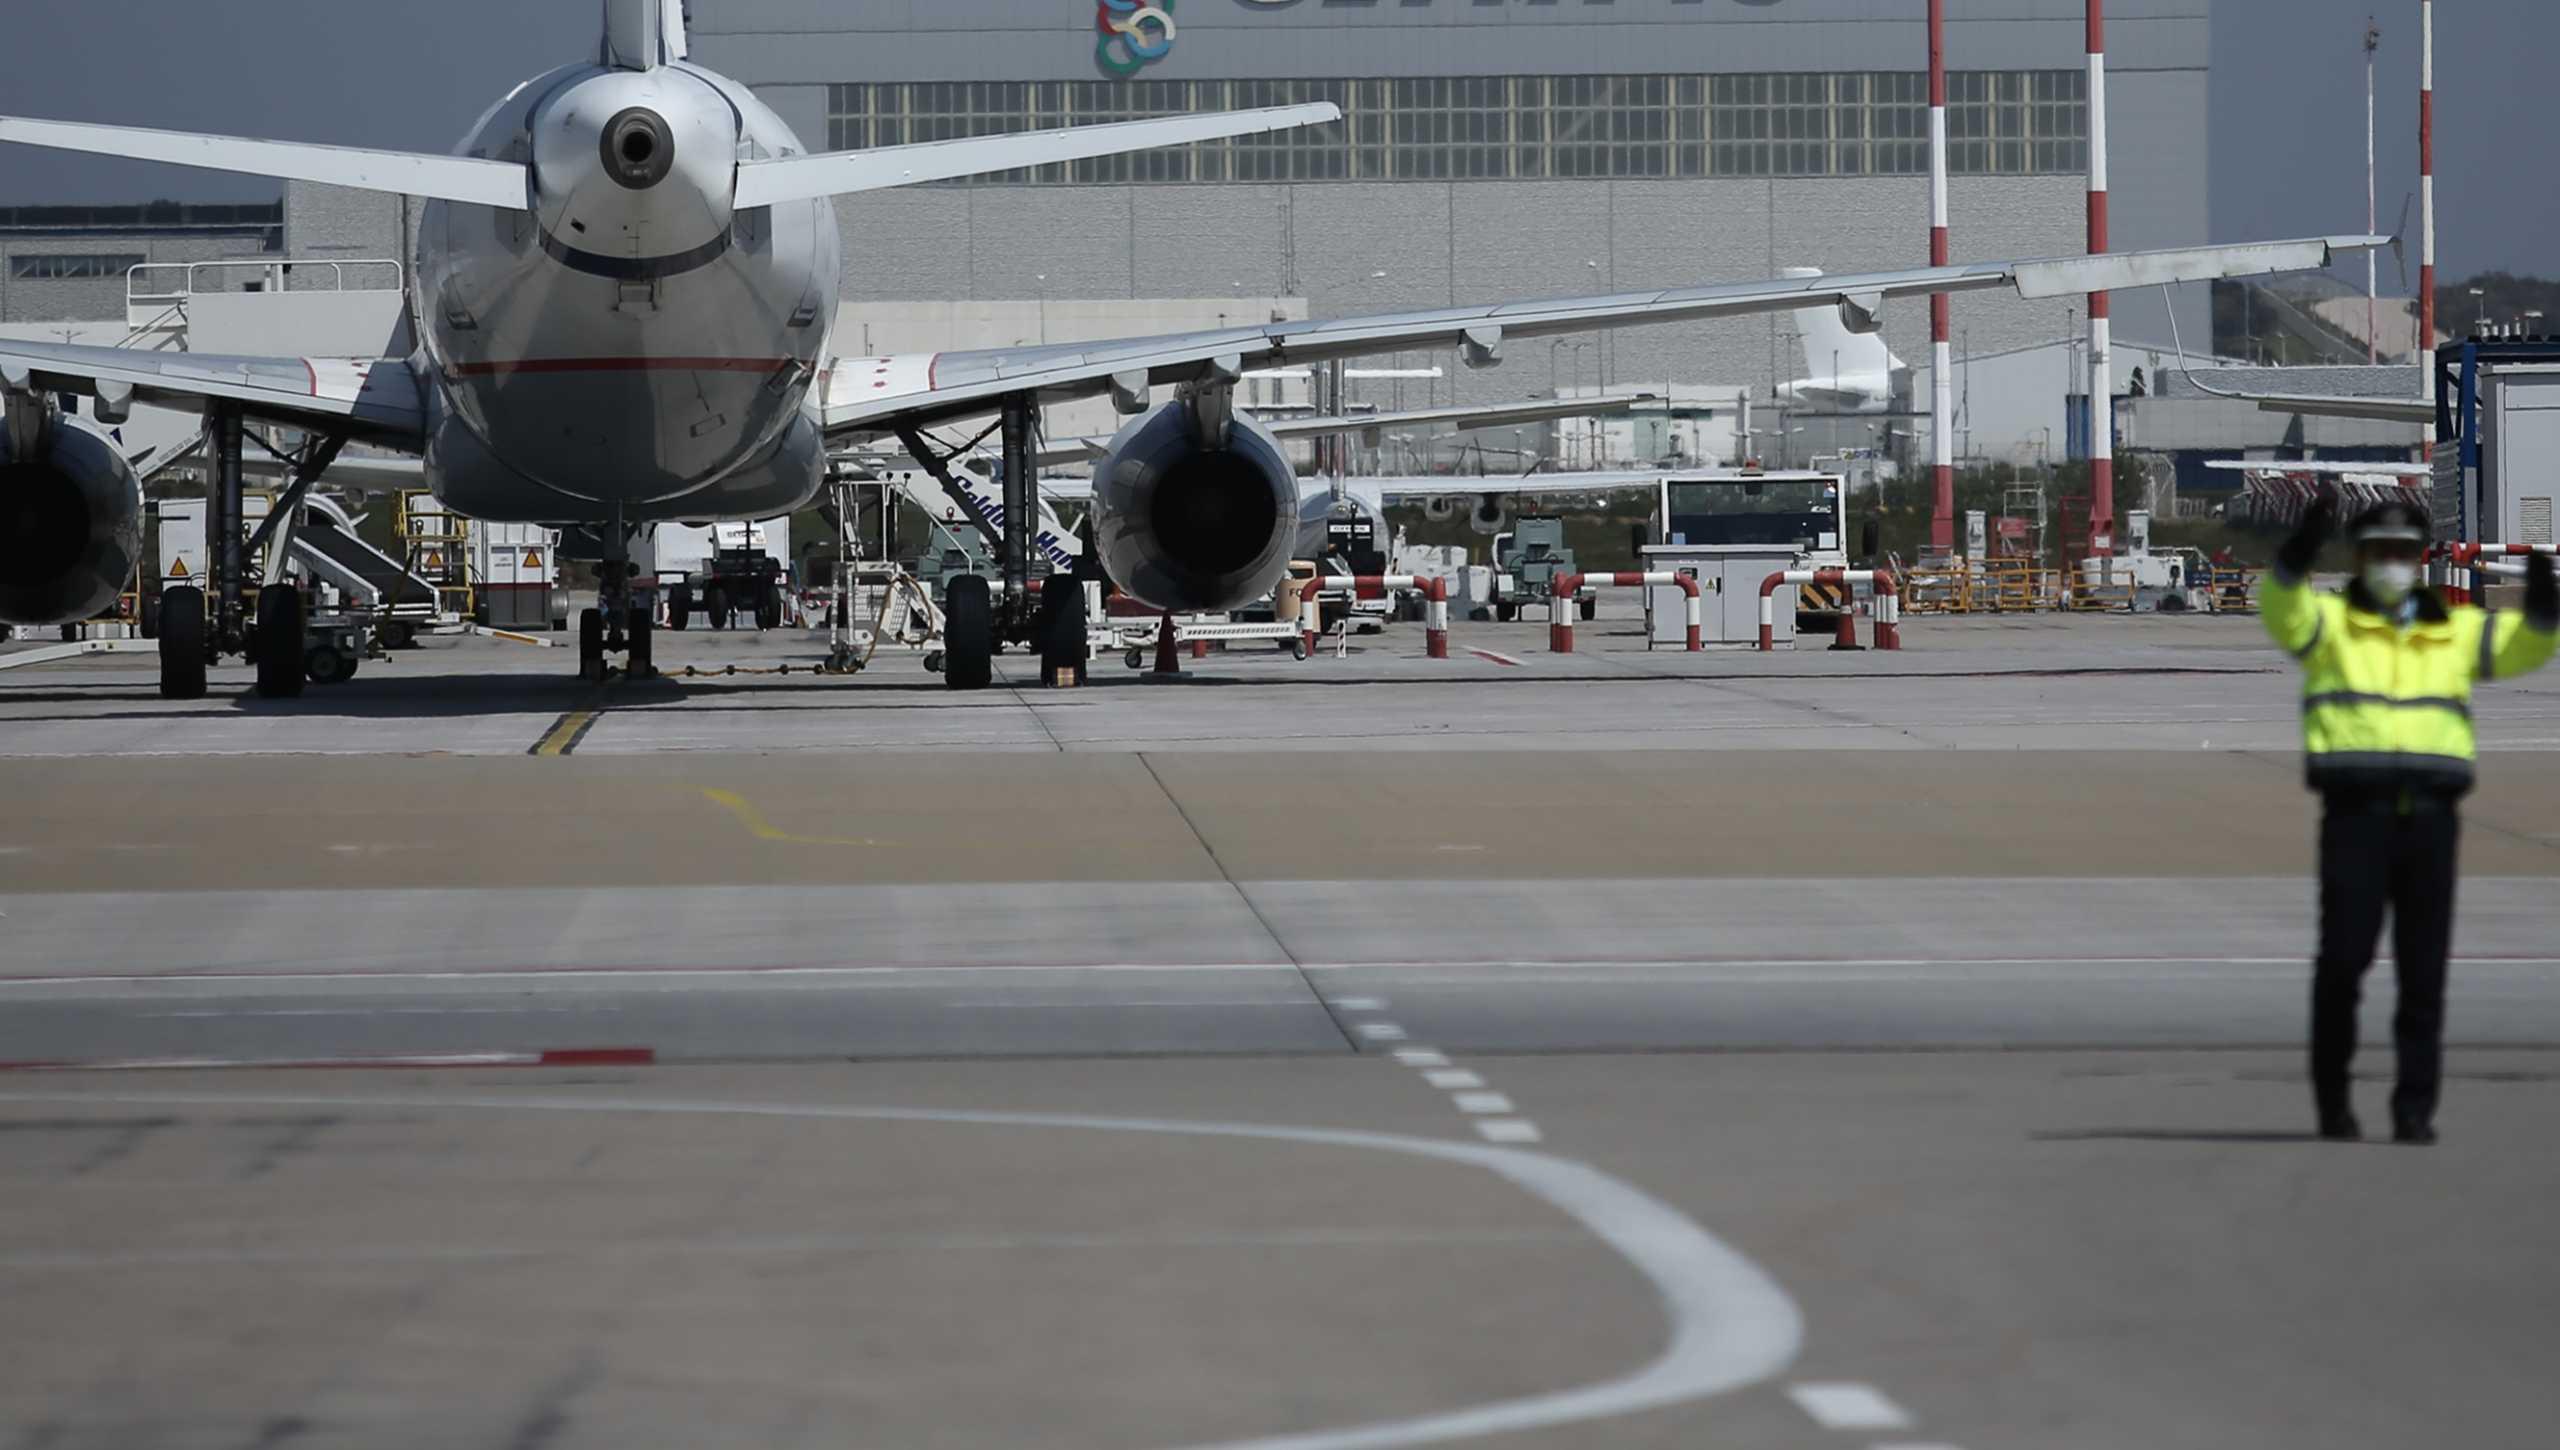 EΚΠΟΙΖΩ: Καταναλωτές περιμένουν τα χρήματά τους για πτήσεις που ακυρώθηκαν στην πανδημία